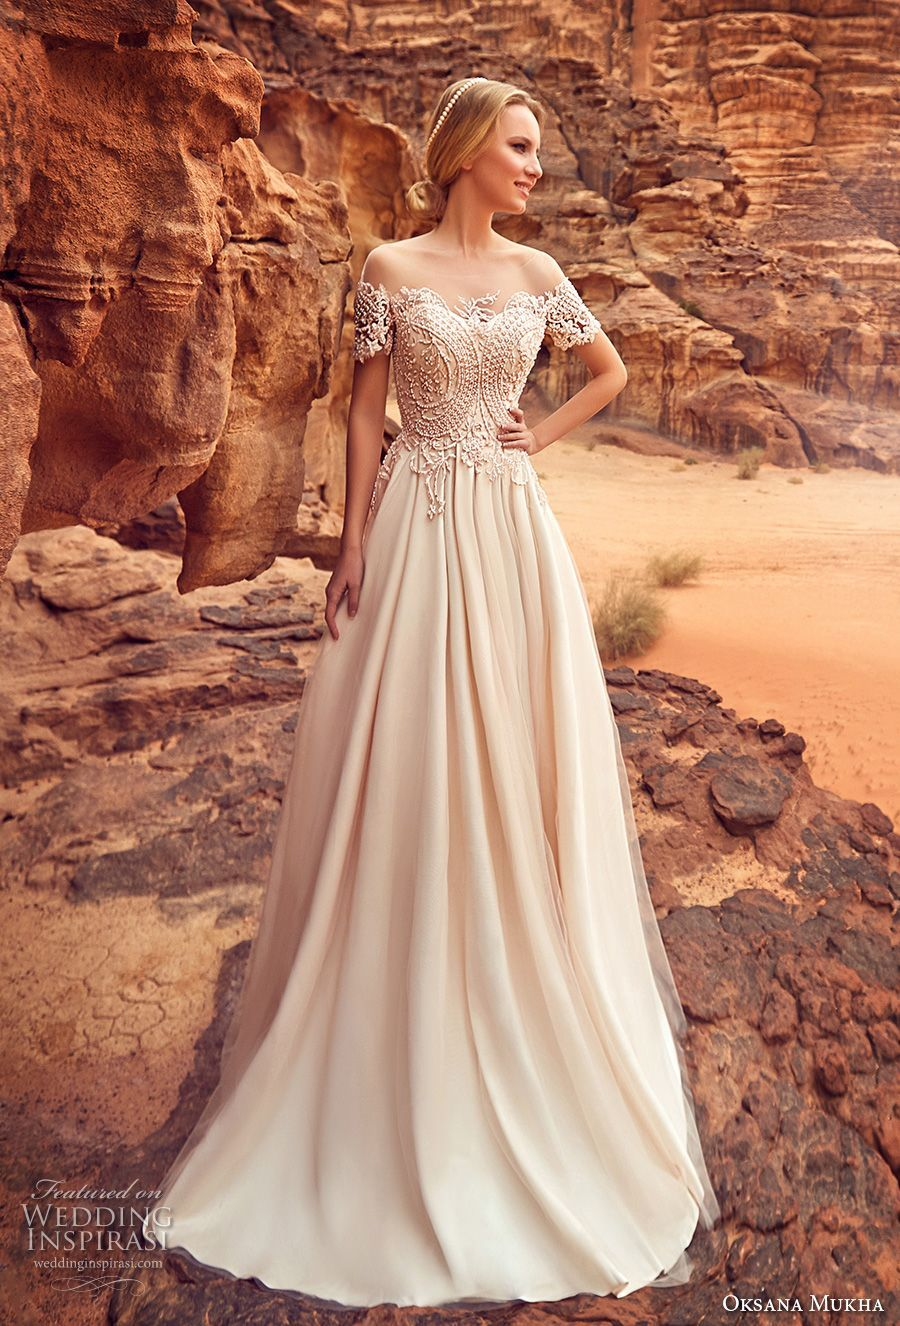 Oksana mukha wedding dresses bodice wedding dress and romantic